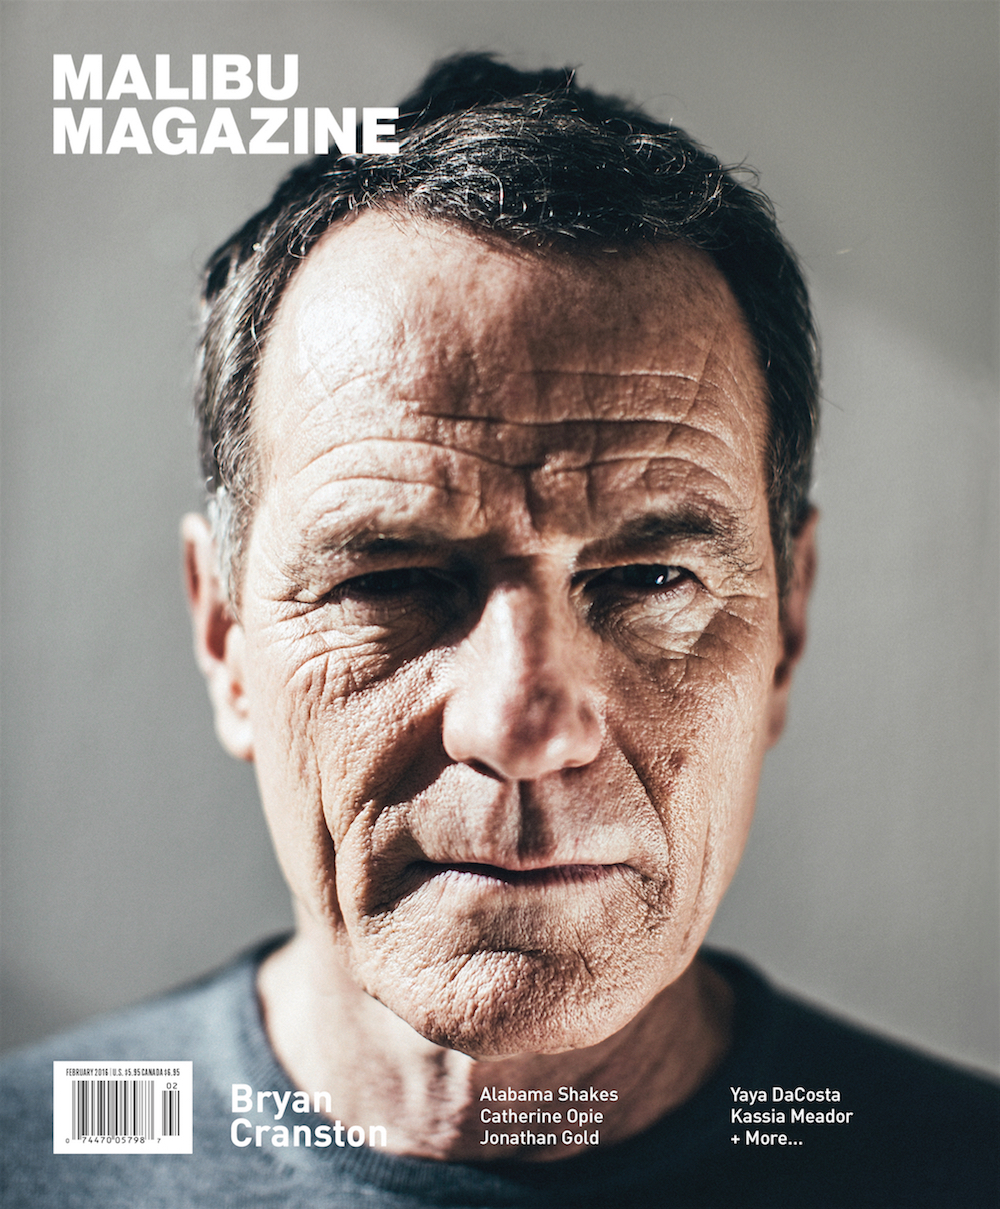 Malibu Magazine | Brian Cranston.jpg